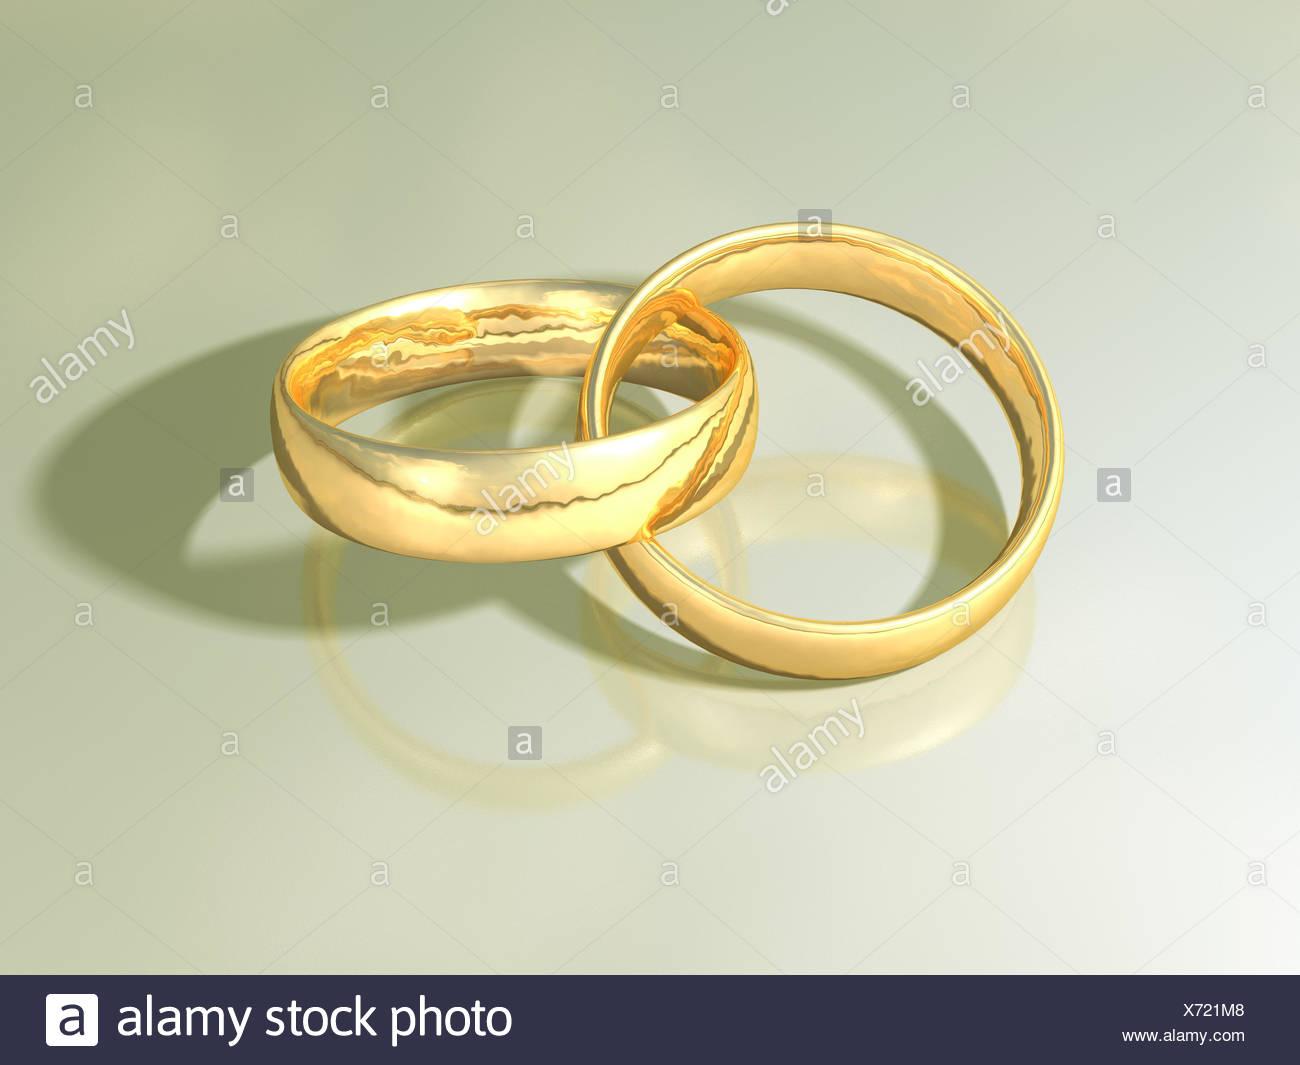 542c7ec84ea1f partnership rings wedding rings faithfulness love in love fell in ...